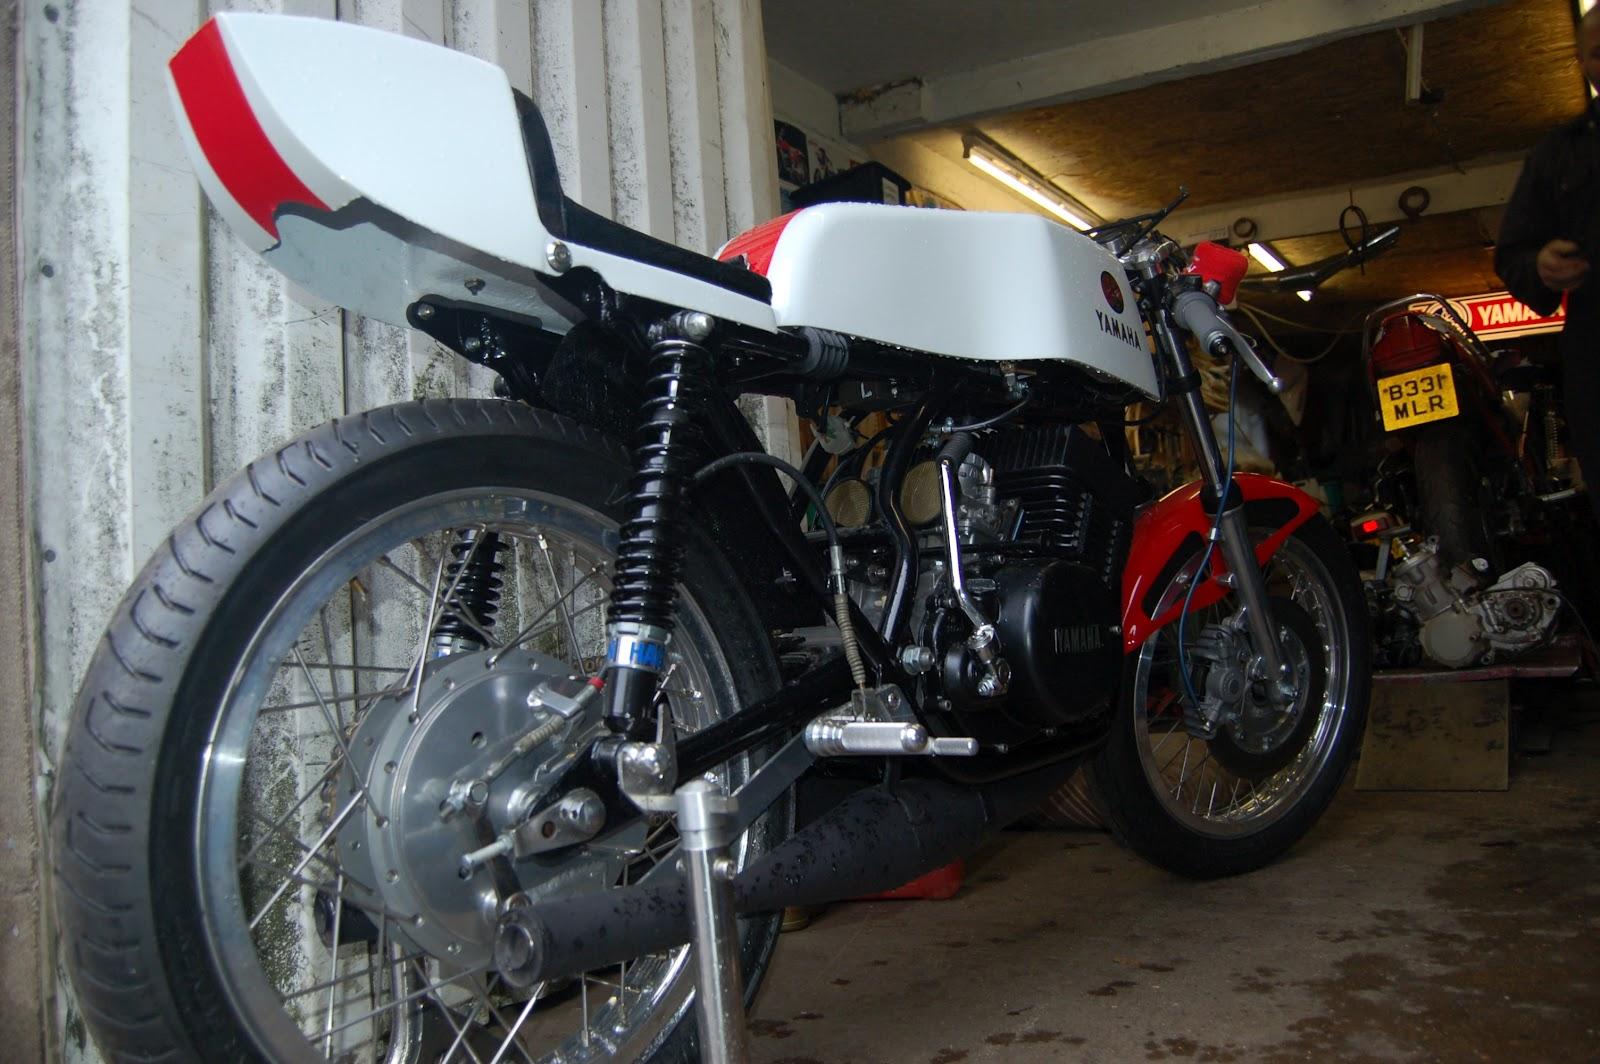 European motorcycle diaries spirit of the seventies yamaha rd400tz350 hybrid falaconquin